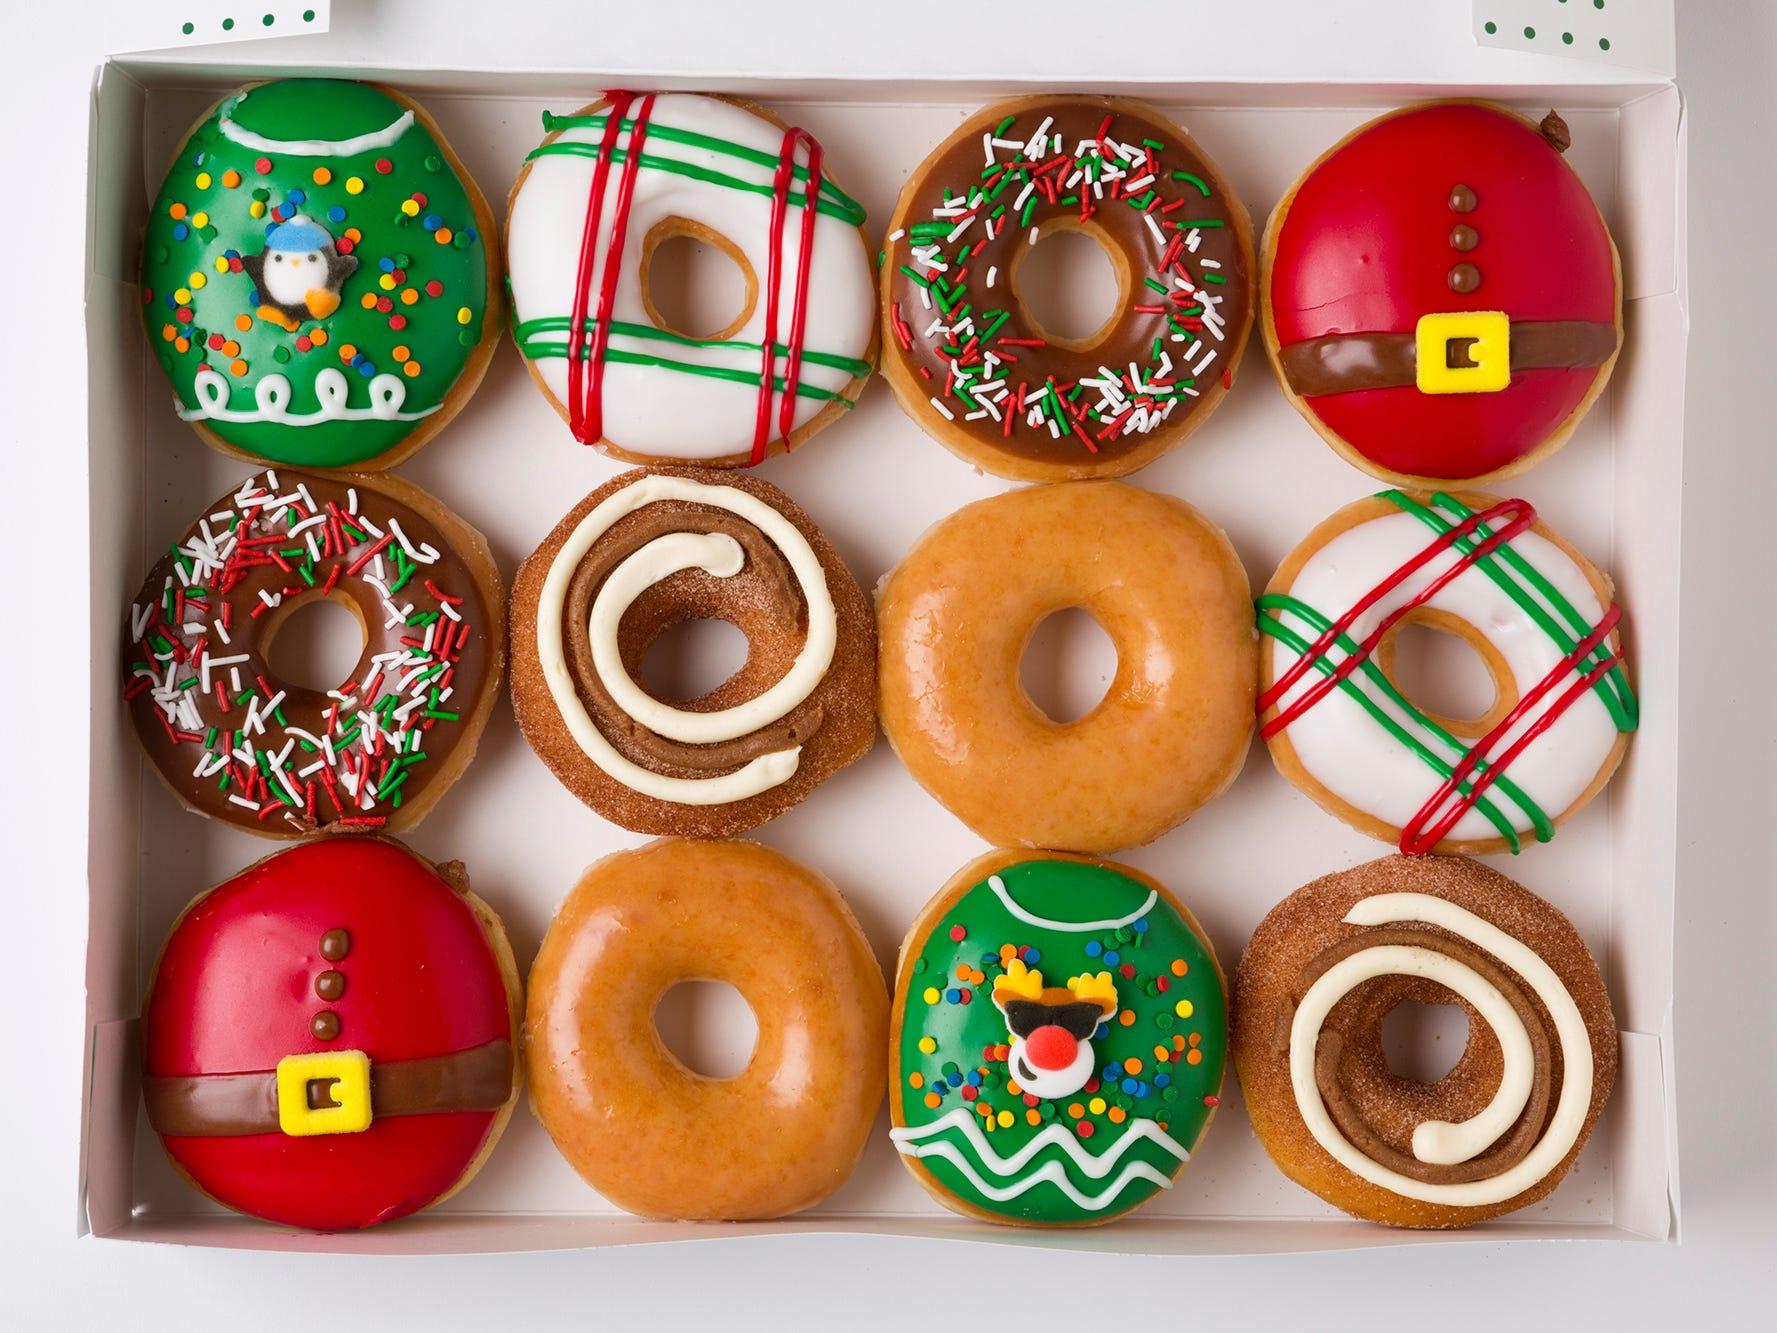 Krispy Kreme celebrates 'Day of Dozens' today with $1 donuts deal